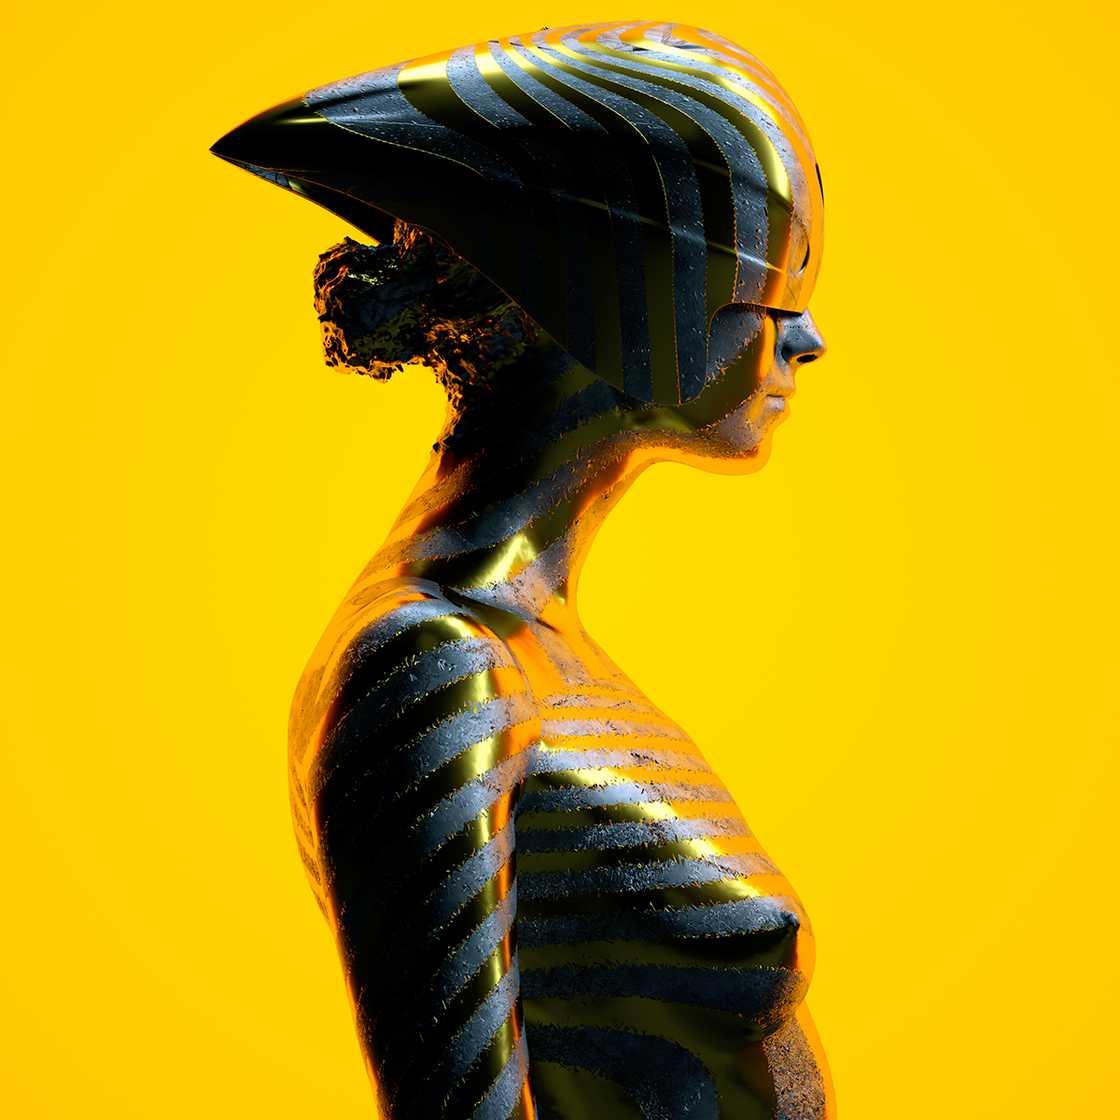 As ilustracoes surrealistas de Antoni Tudisco